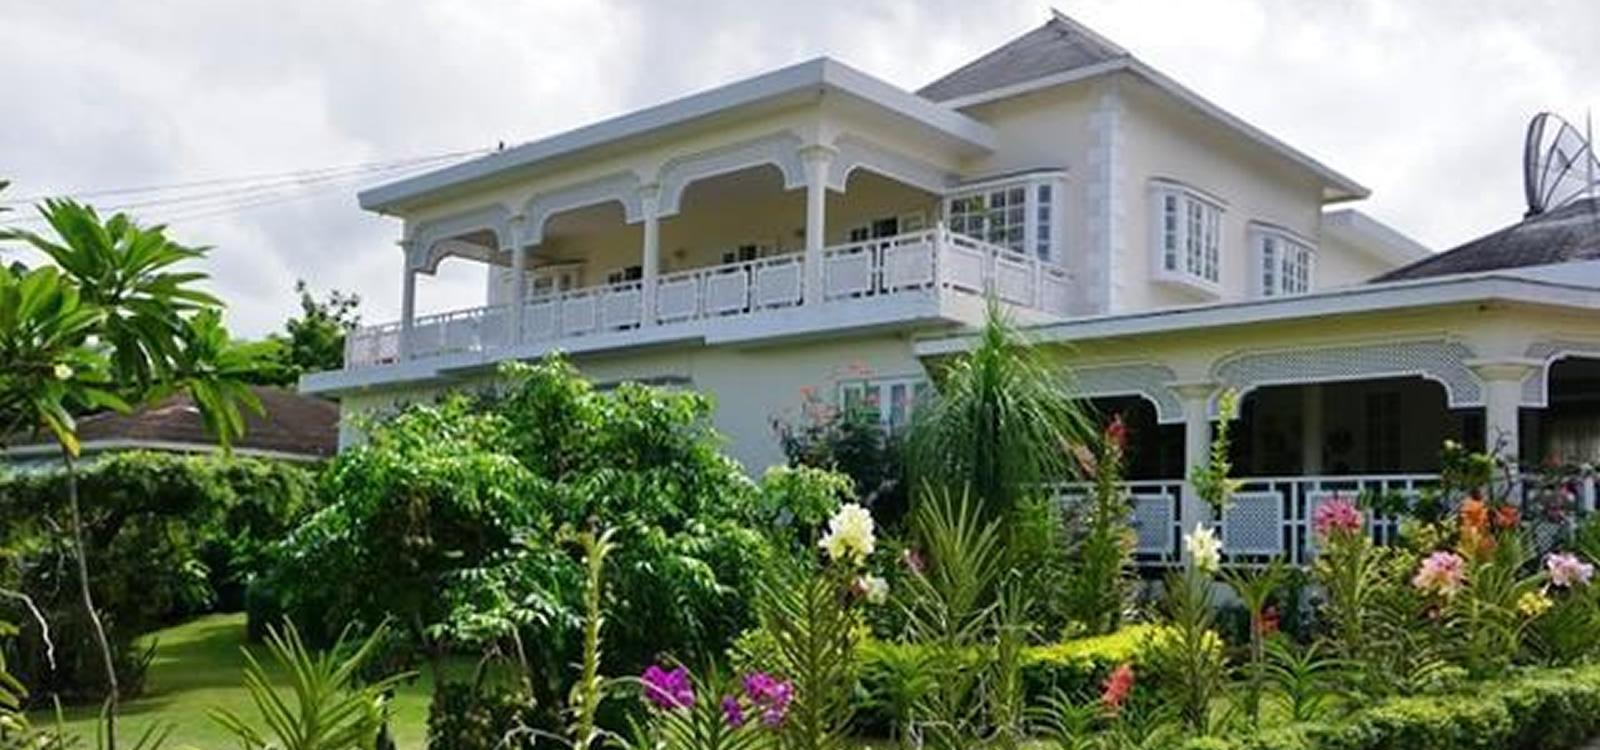 4 Bedroom Home For Sale, Ironshore, Montego Bay, Jamaica